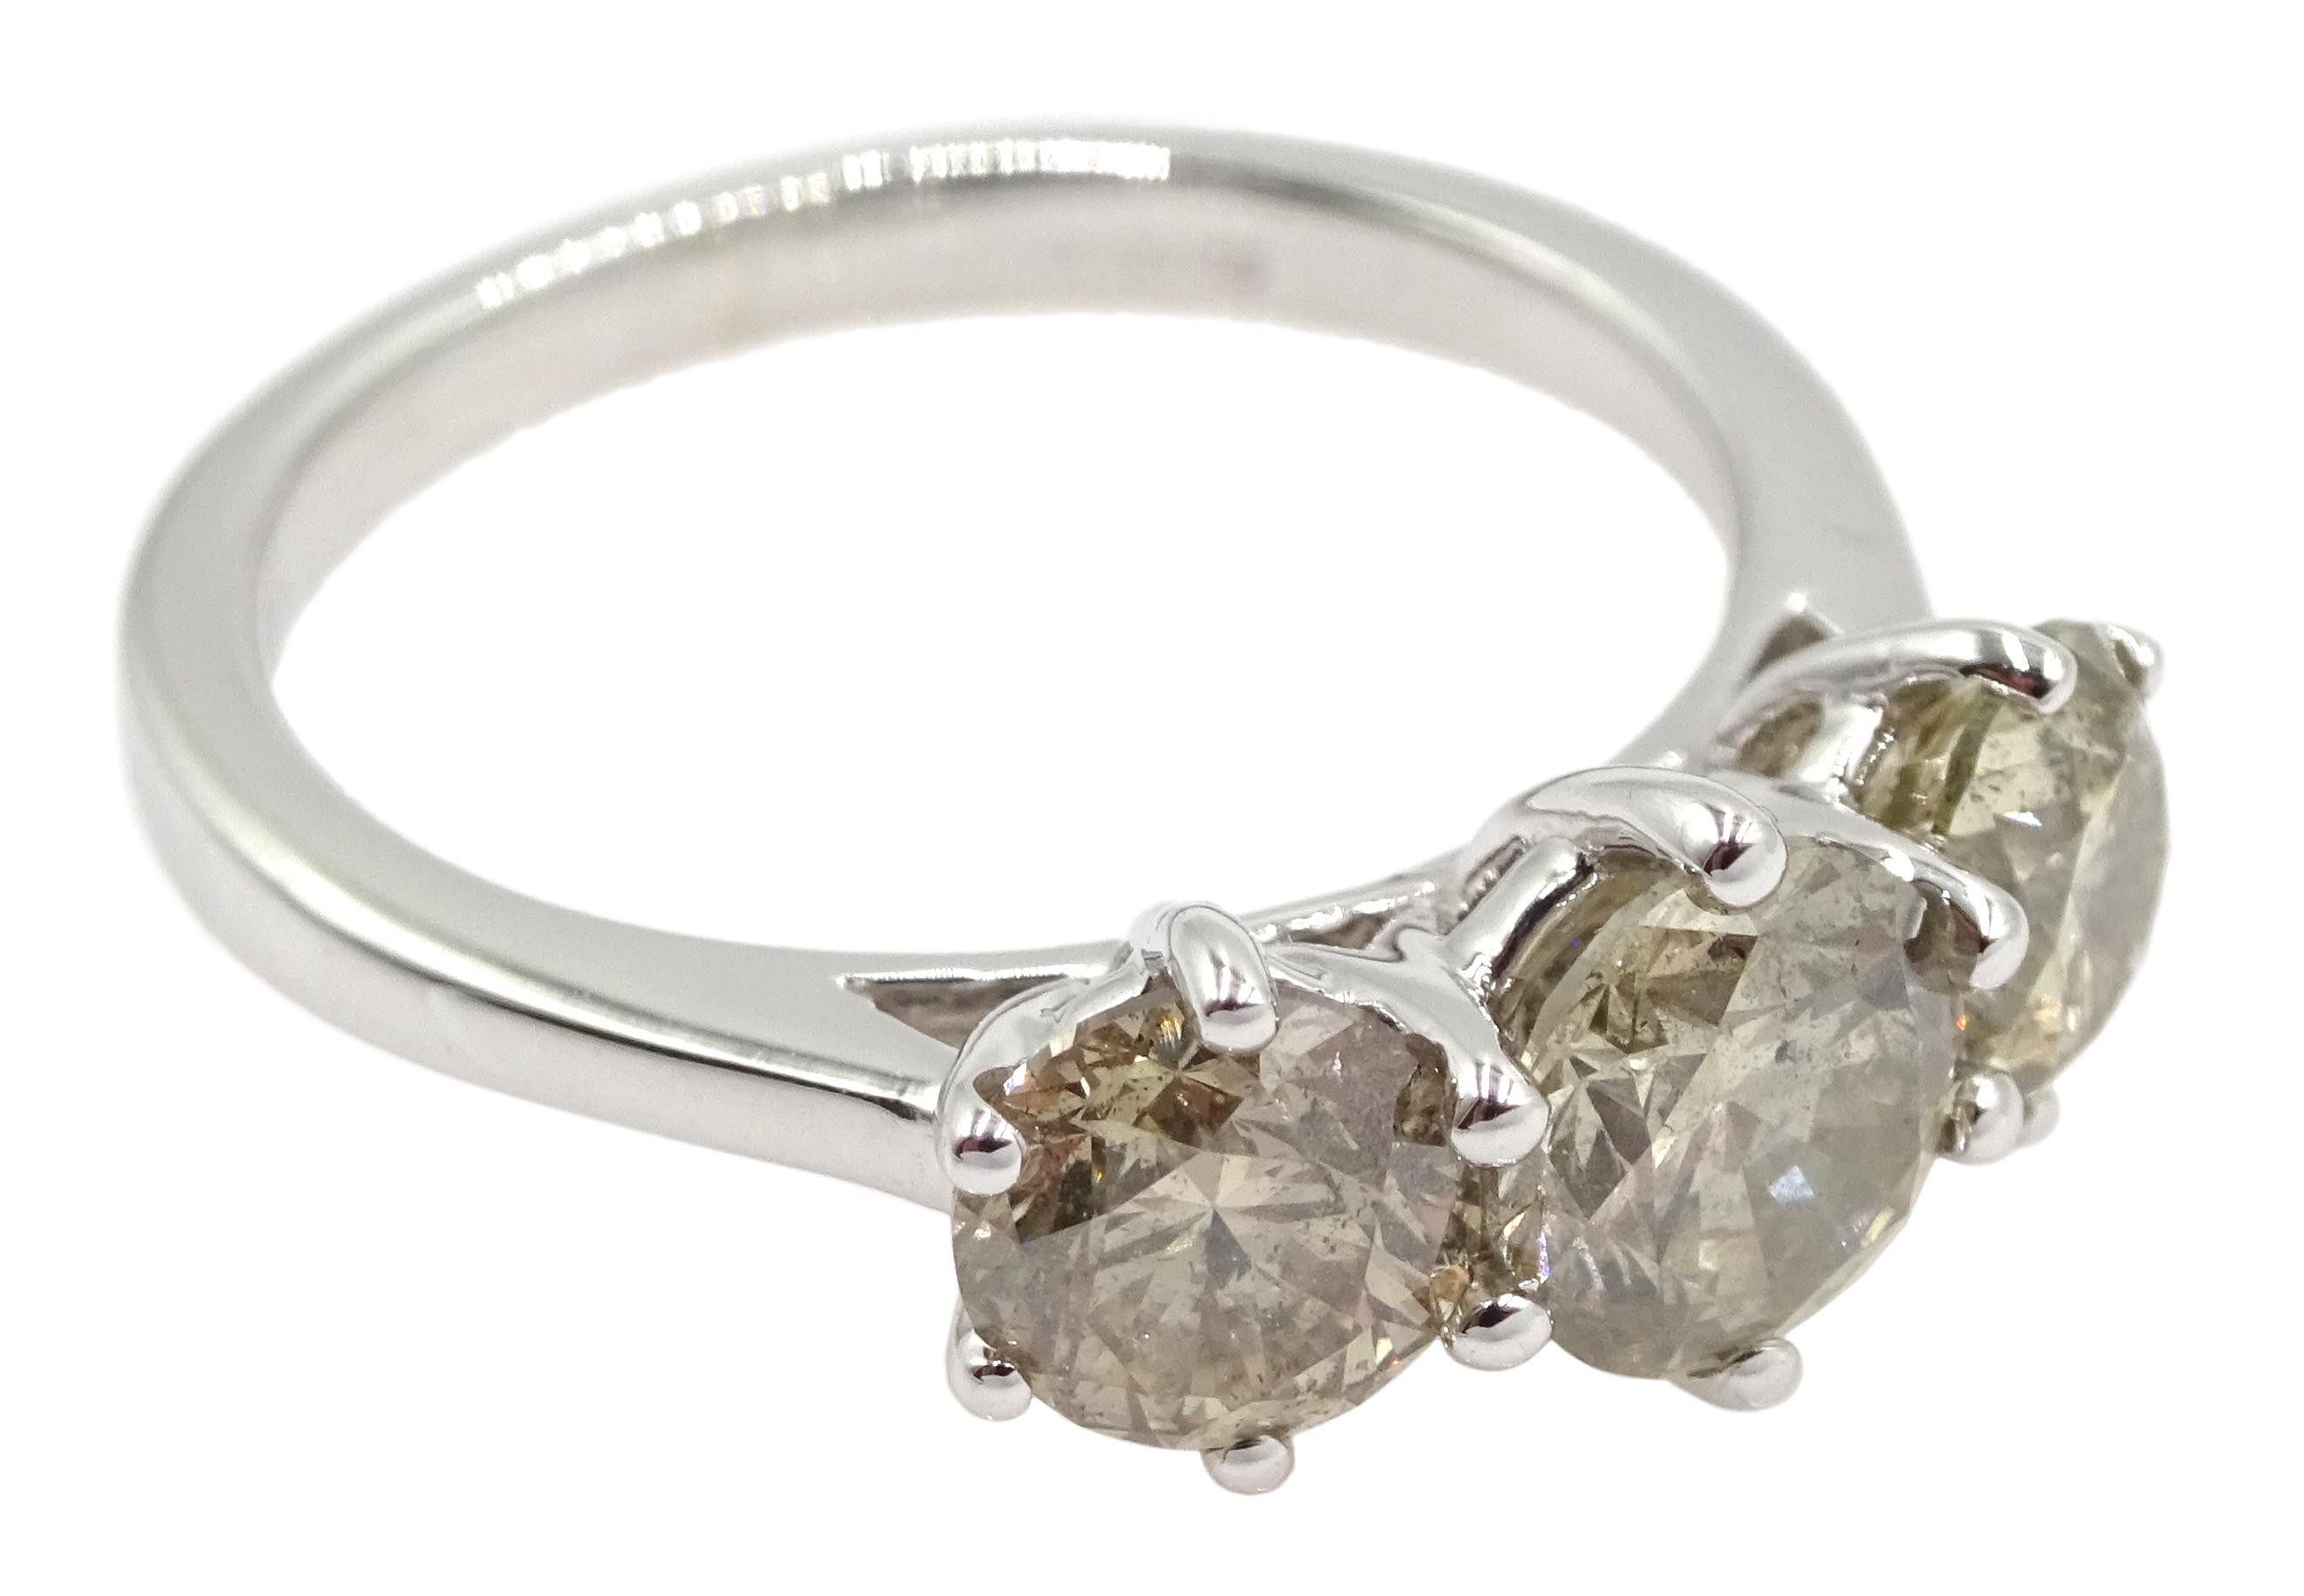 18ct white gold three stone round brilliant cut diamond ring, total diamond weight 2.16 carat, - Image 3 of 7